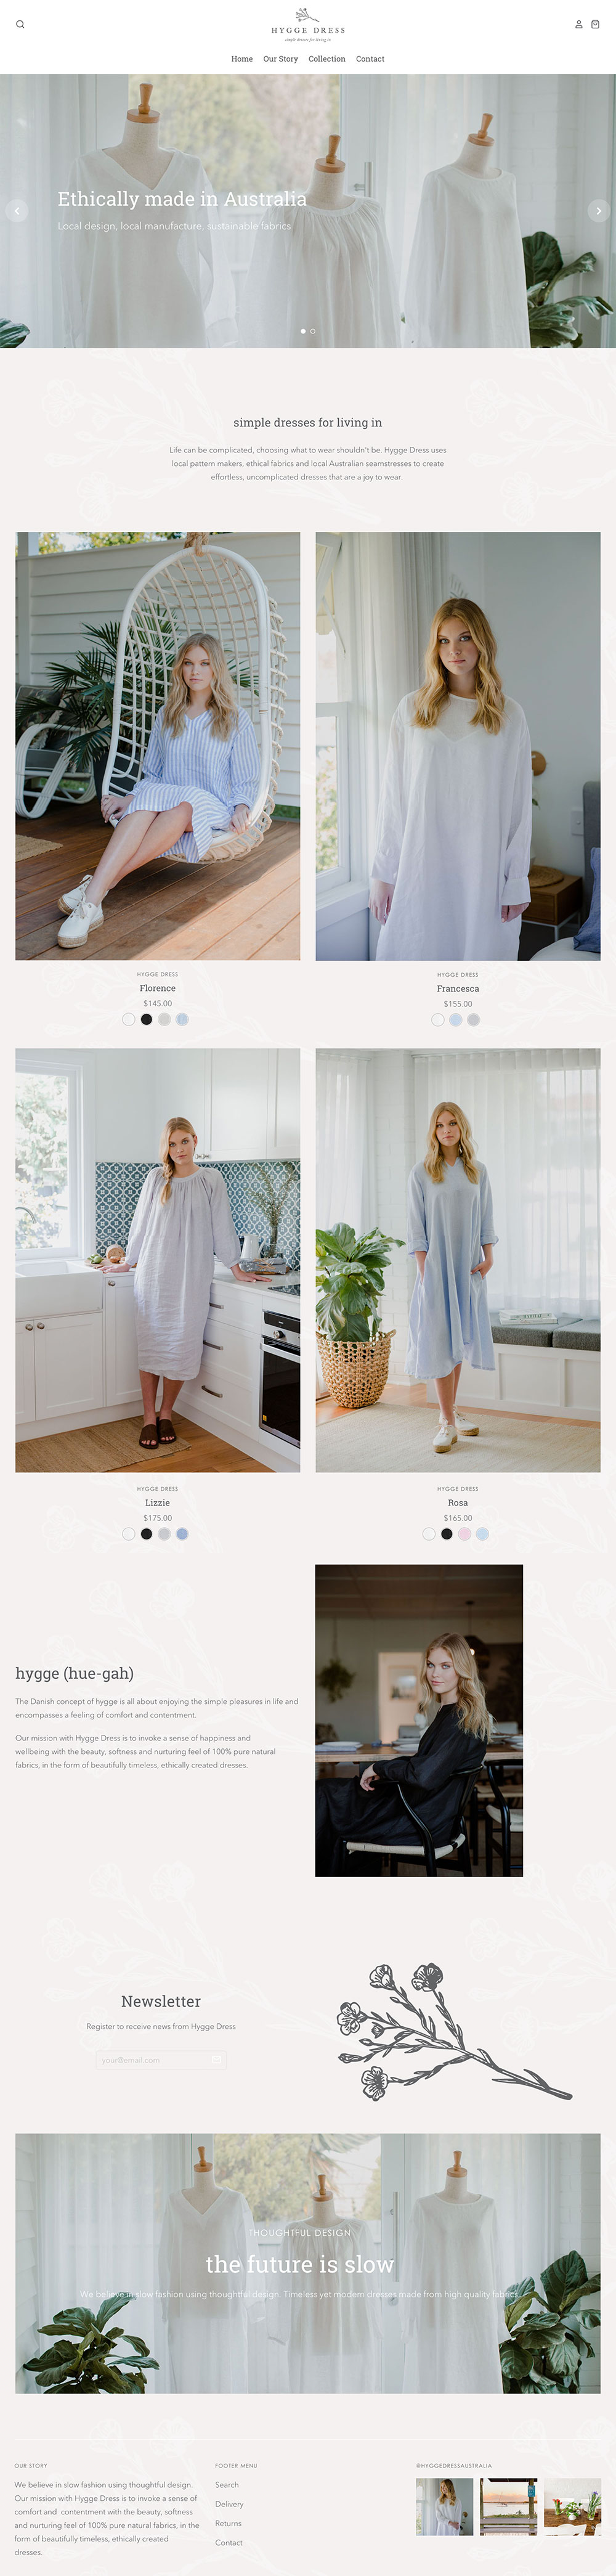 Hygge Dress Web Design Home Page - Shopify Web Design Little Palm Creative Gold Coast